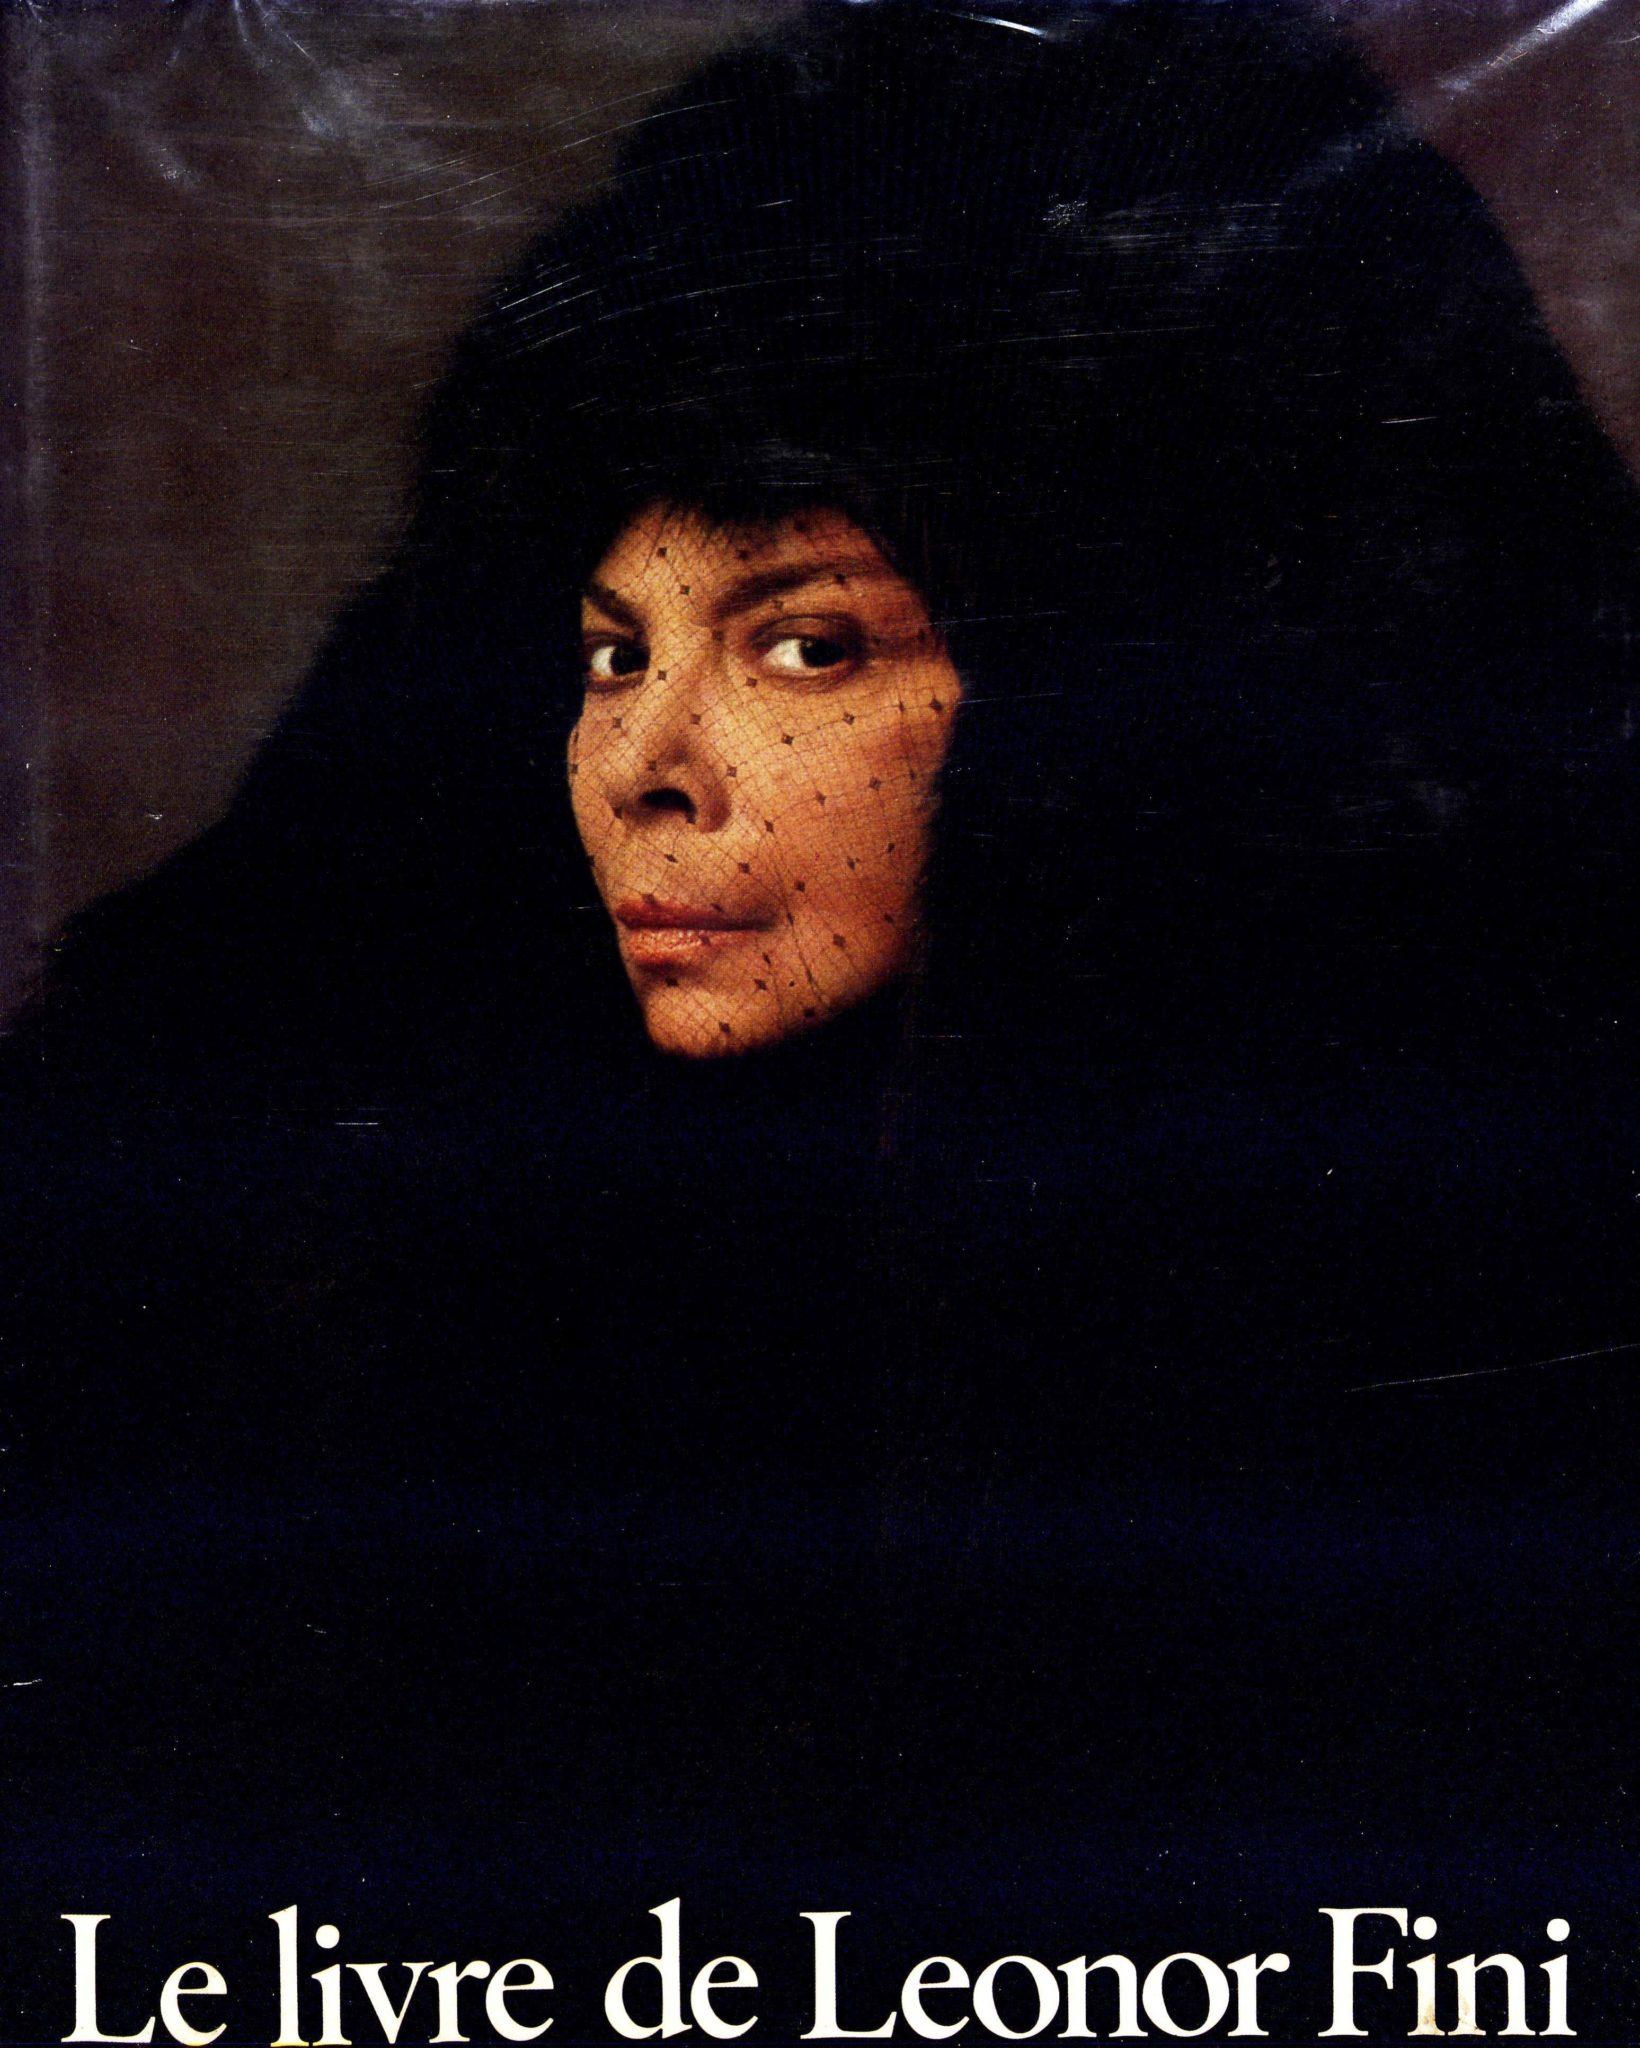 Leonor Fini, <br /><em>LeLivre deLeonorFini. Peintures, dessins, écrits, notes deLeonorFini</em>, 1975